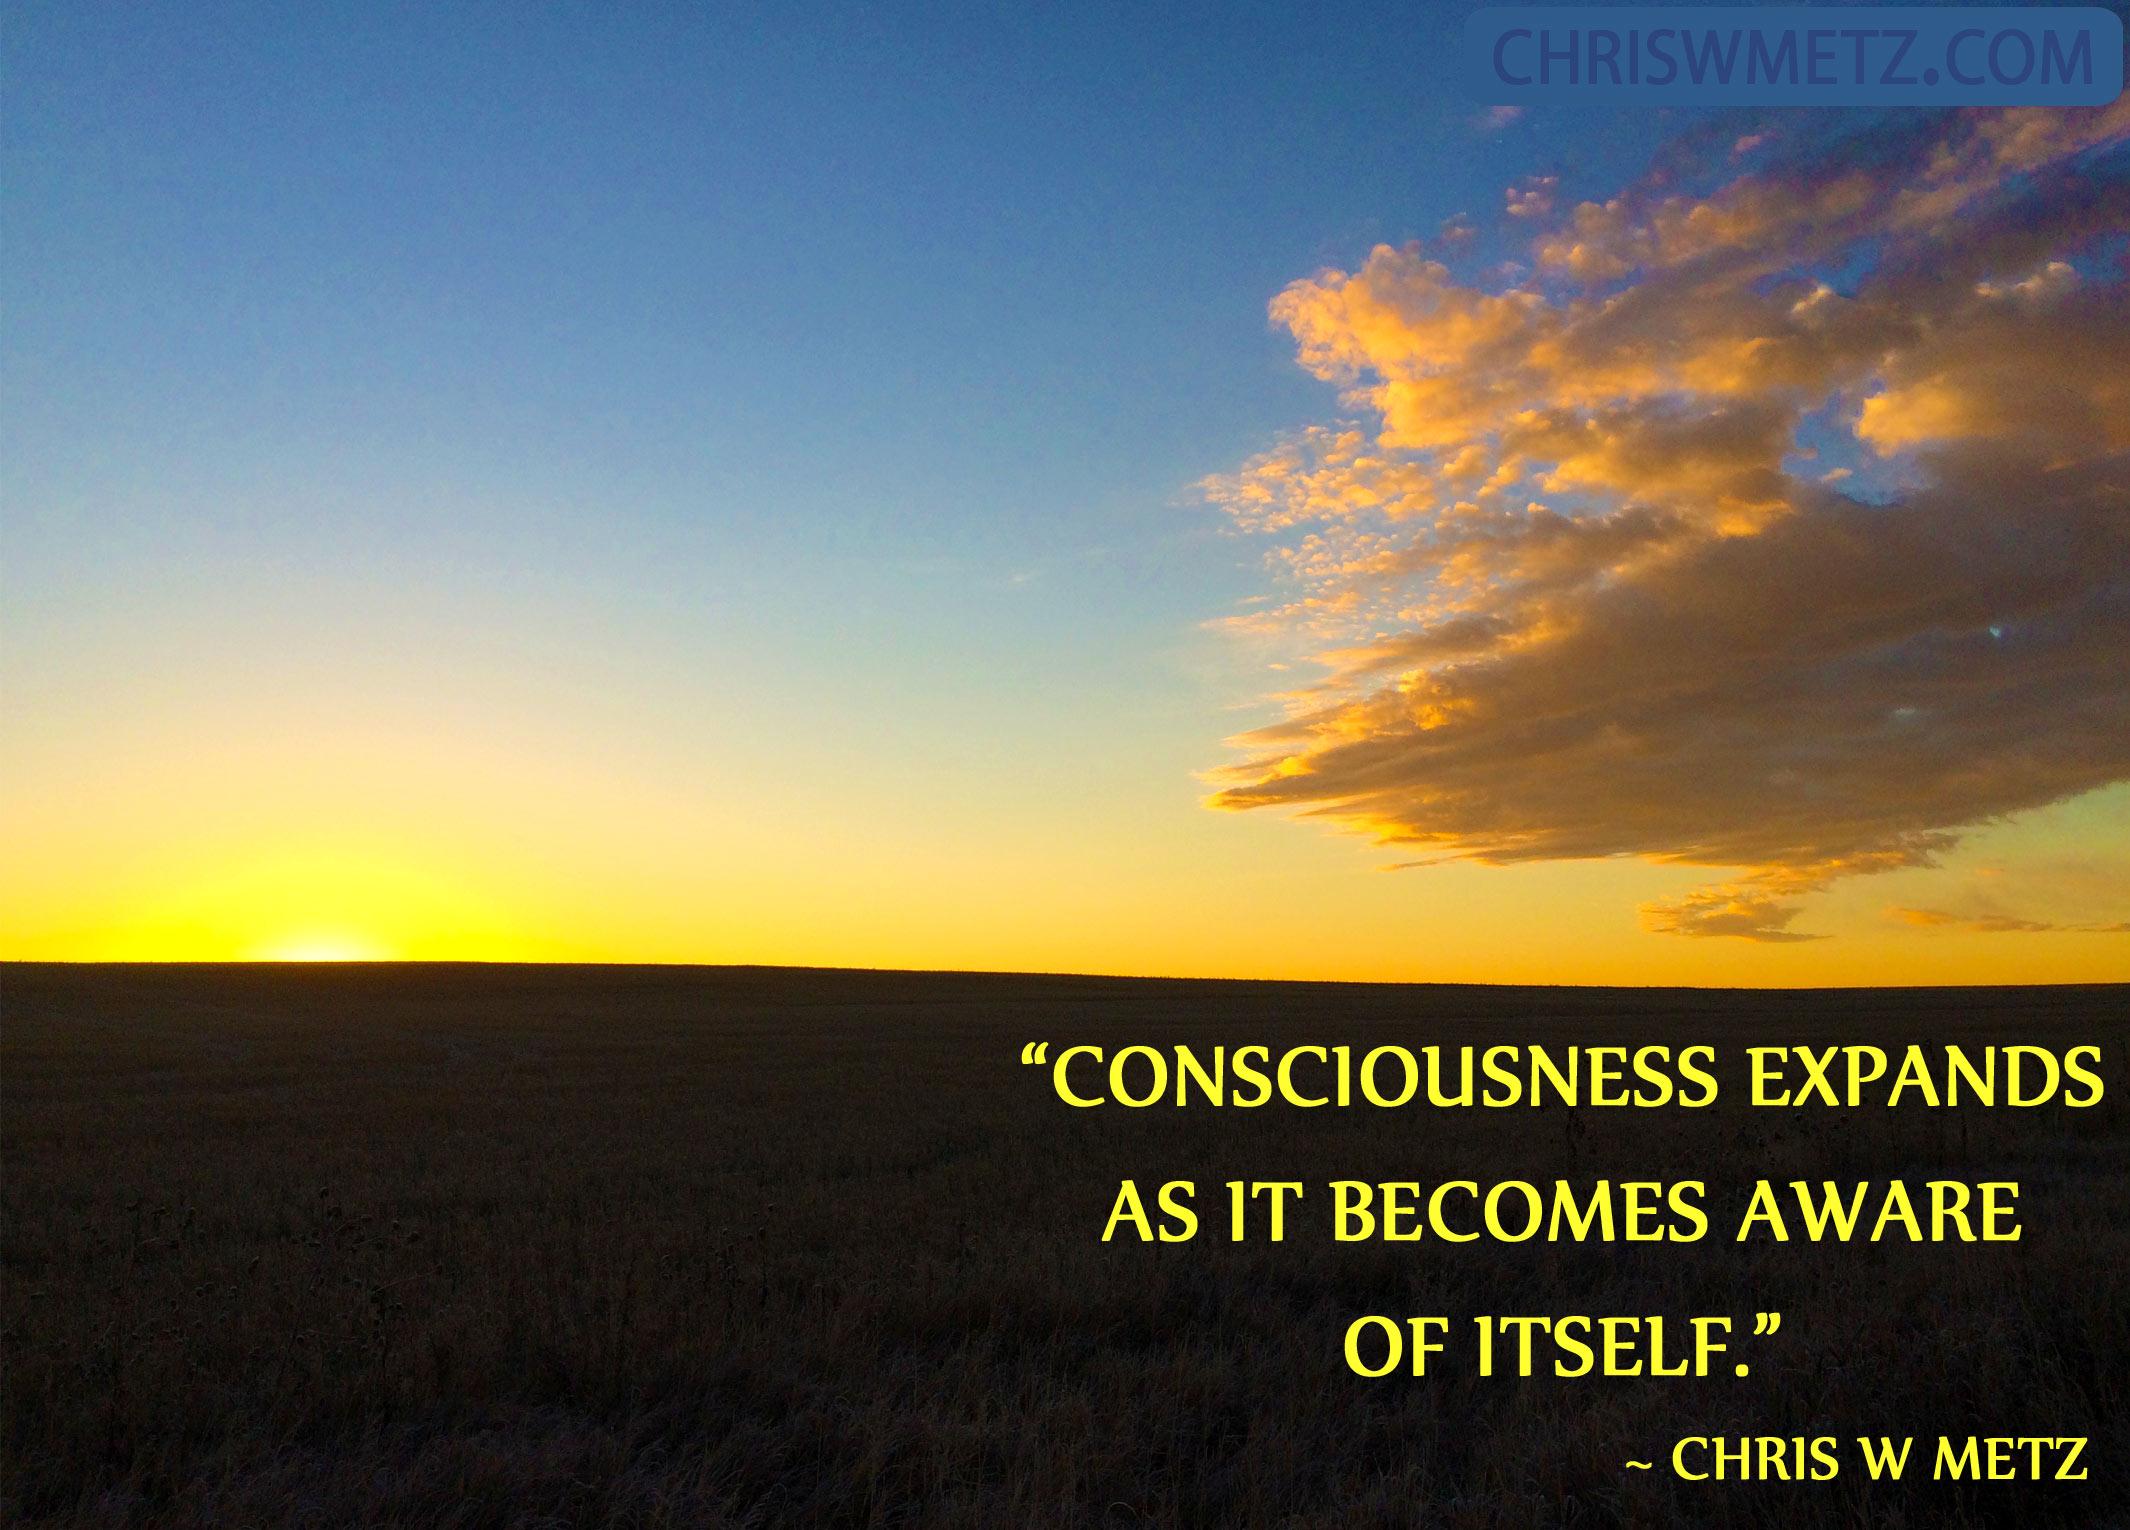 self awareness quote 23 chris w metz chris w metz